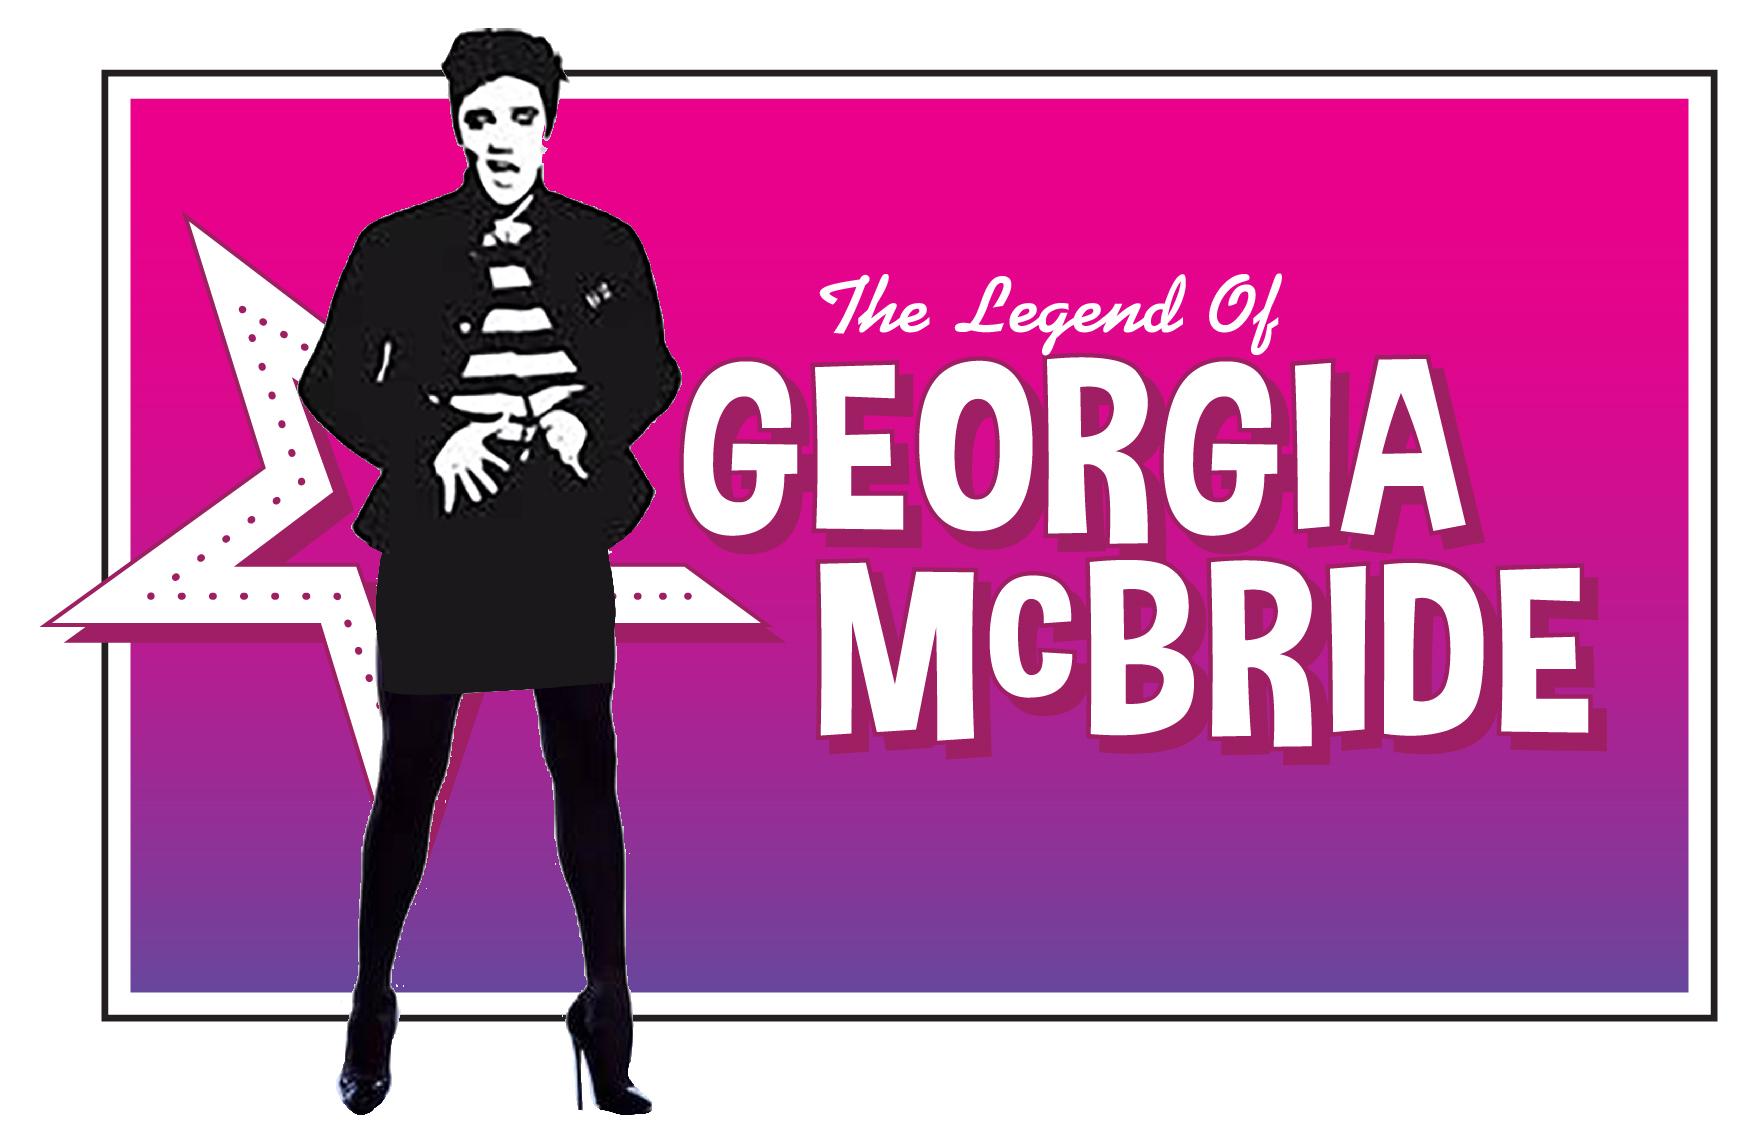 GeorgiaMcBride.jpg